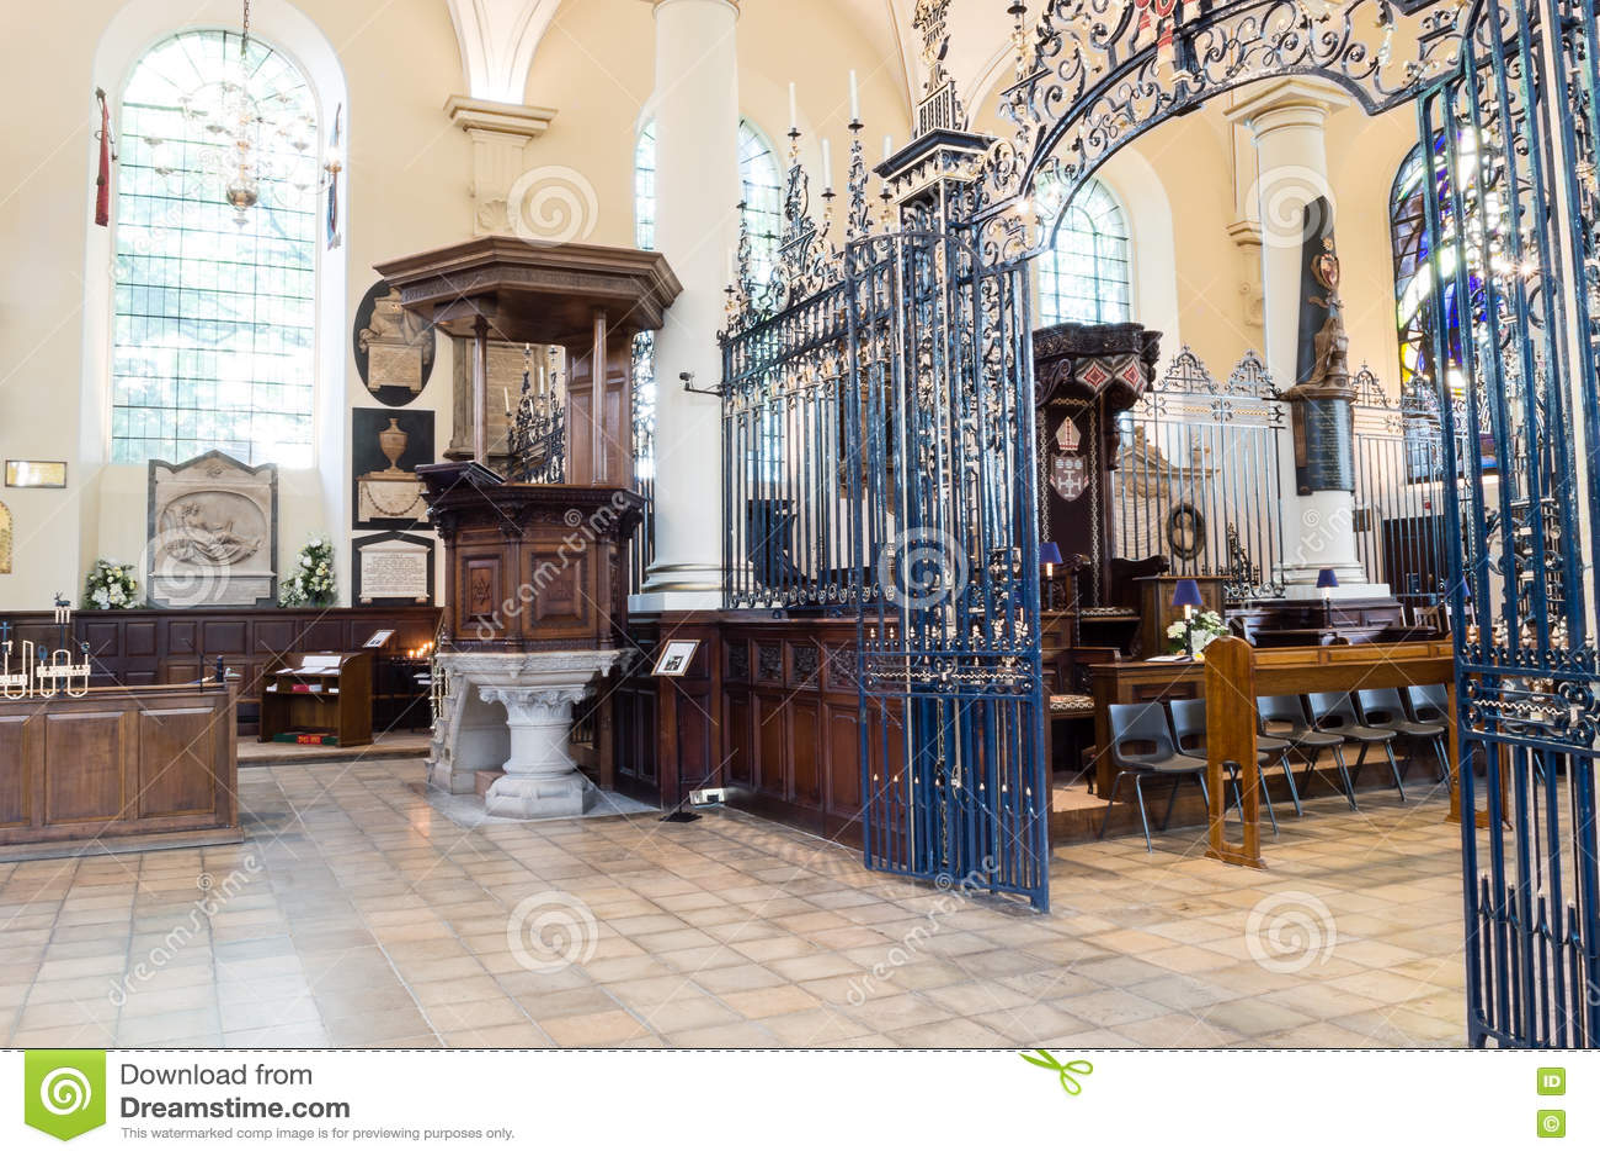 Tela de rood de Derby Cathedral Pulpit e do ferro